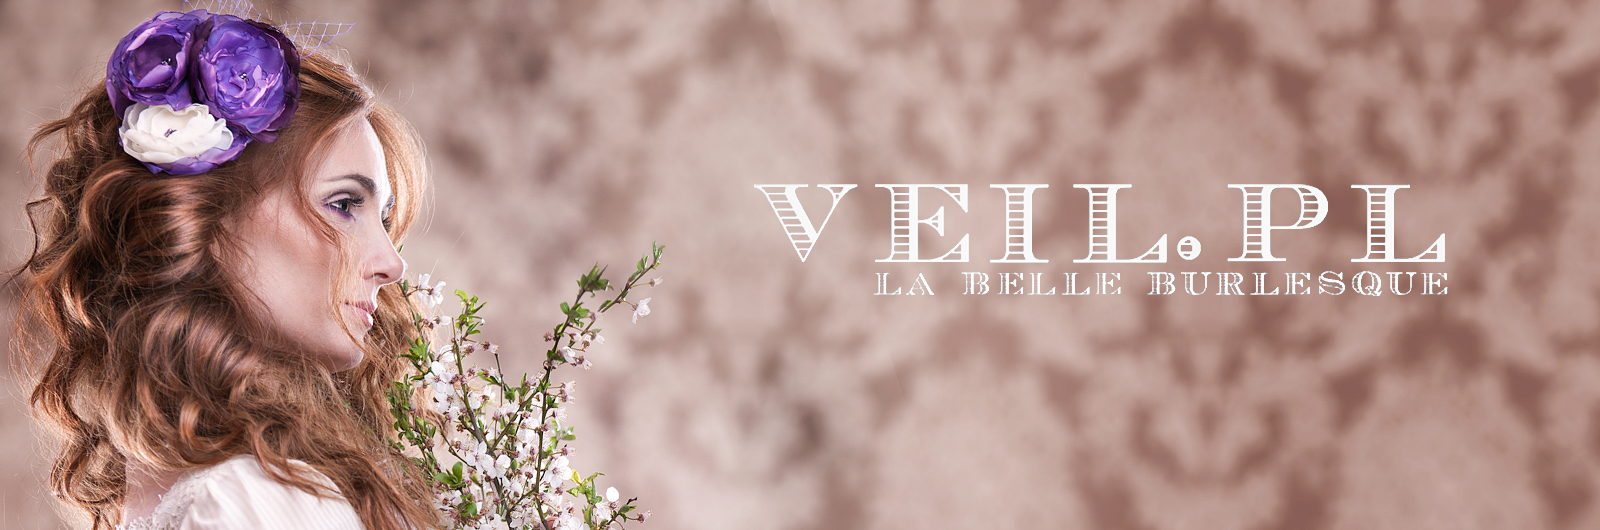 Fotografia reklamowa Veil 378